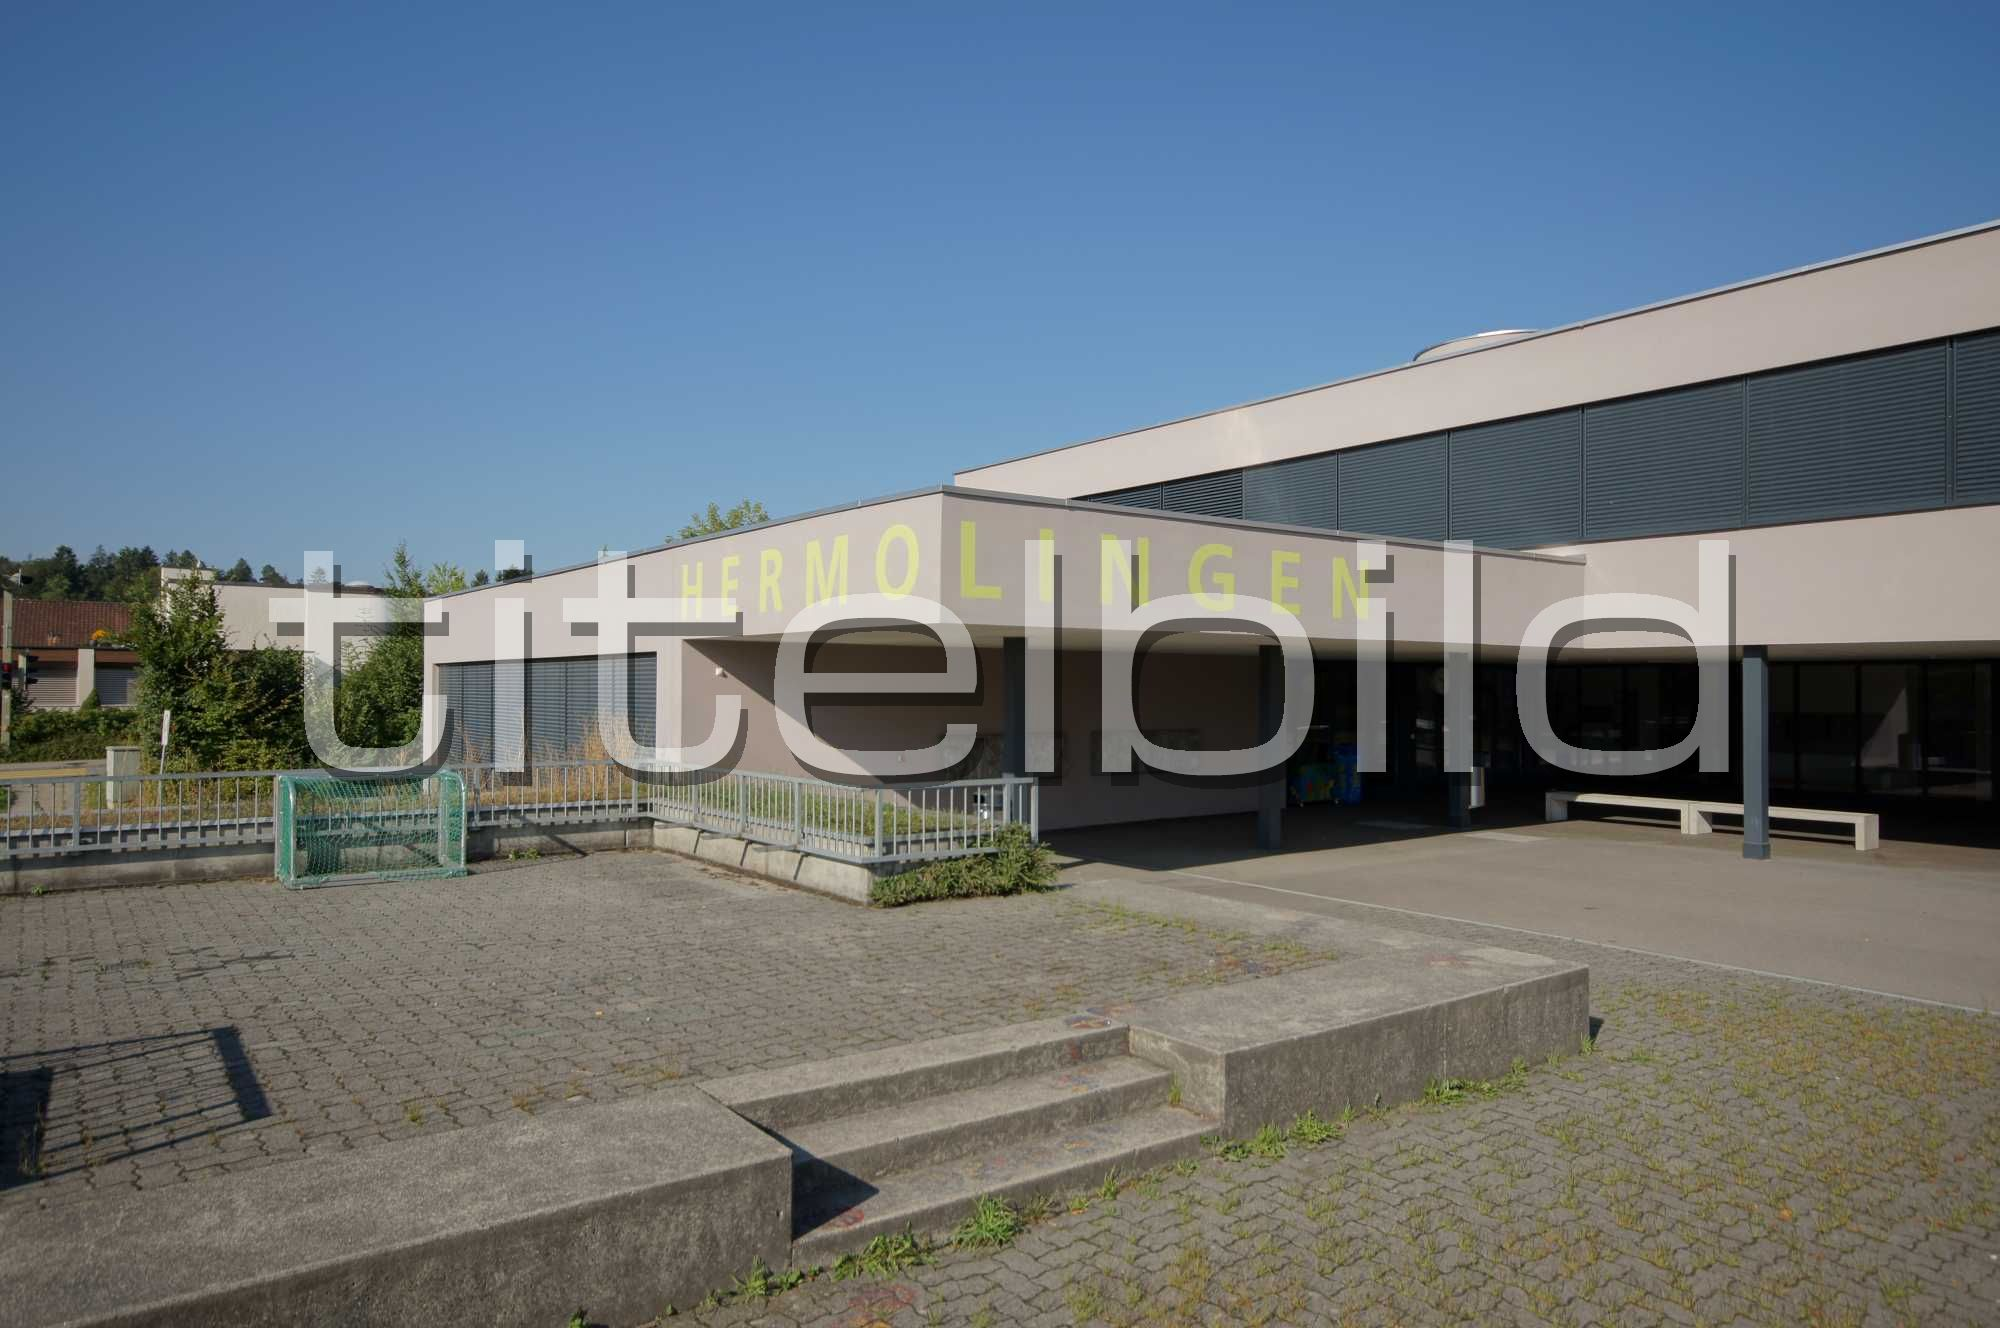 Projektbild-Nr. 1: Schulhaus Hermolingen